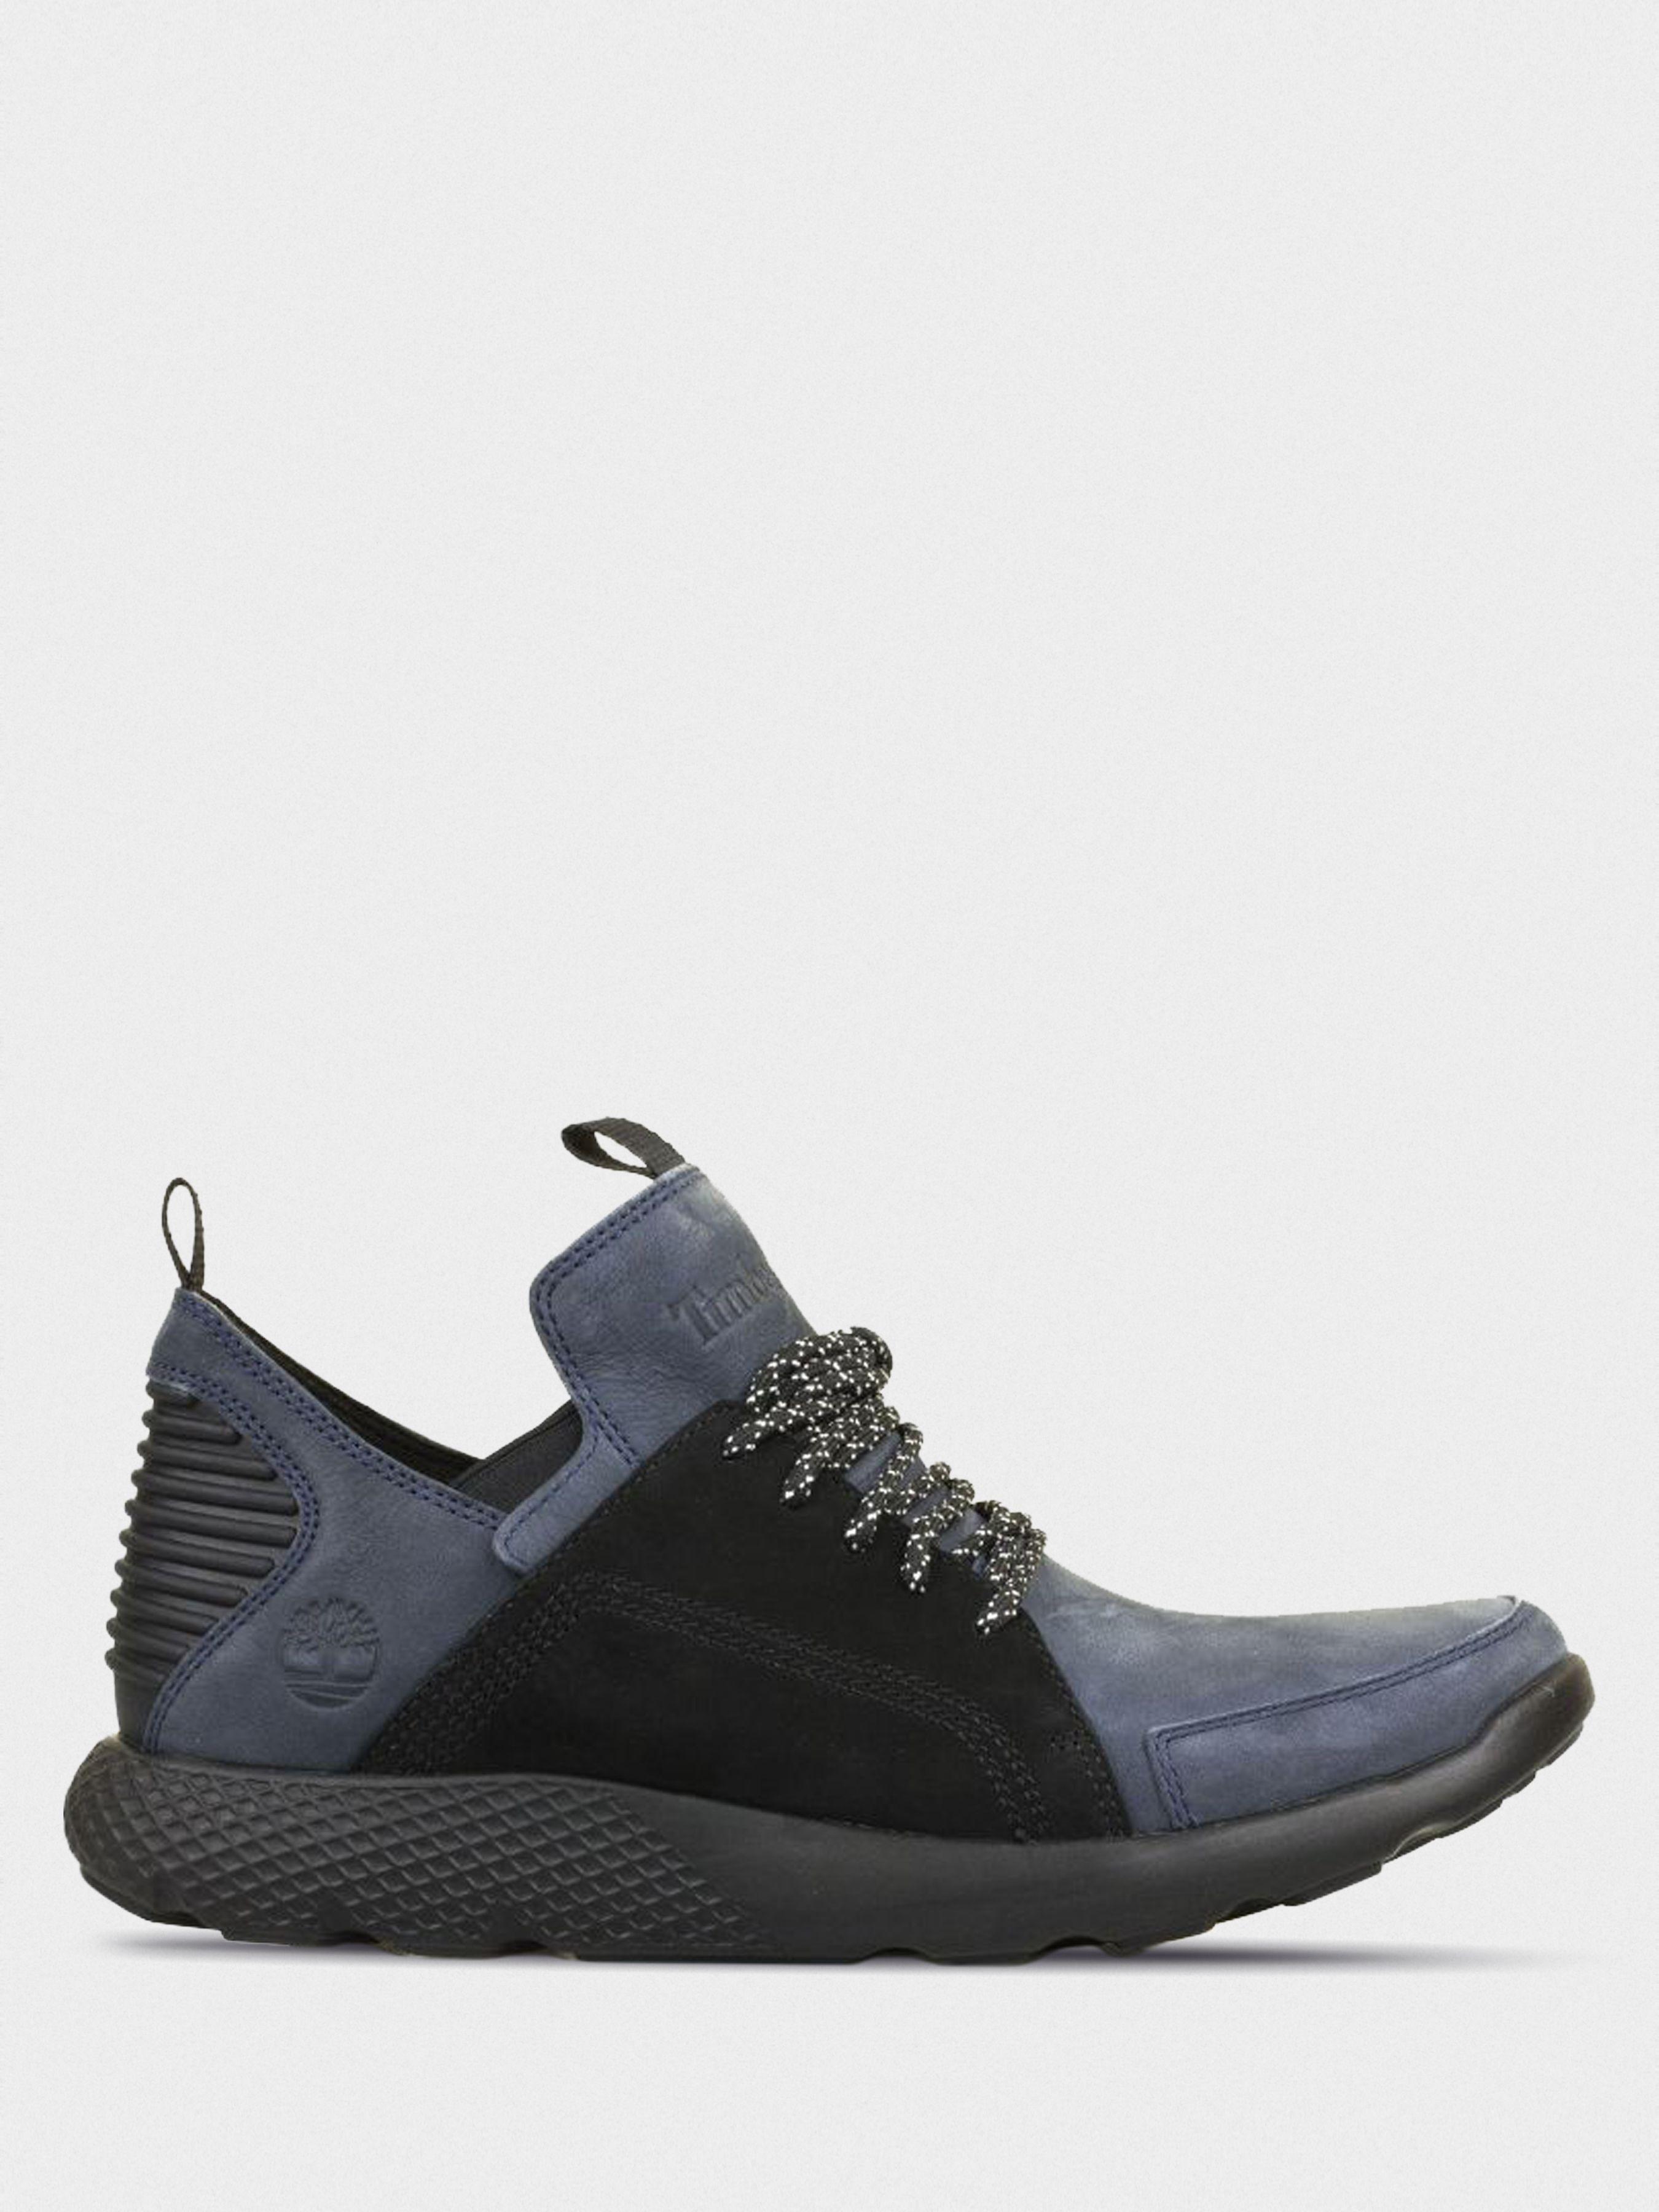 Купить Ботинки мужские Timberland Flyroam Wedge TF3638, Синий